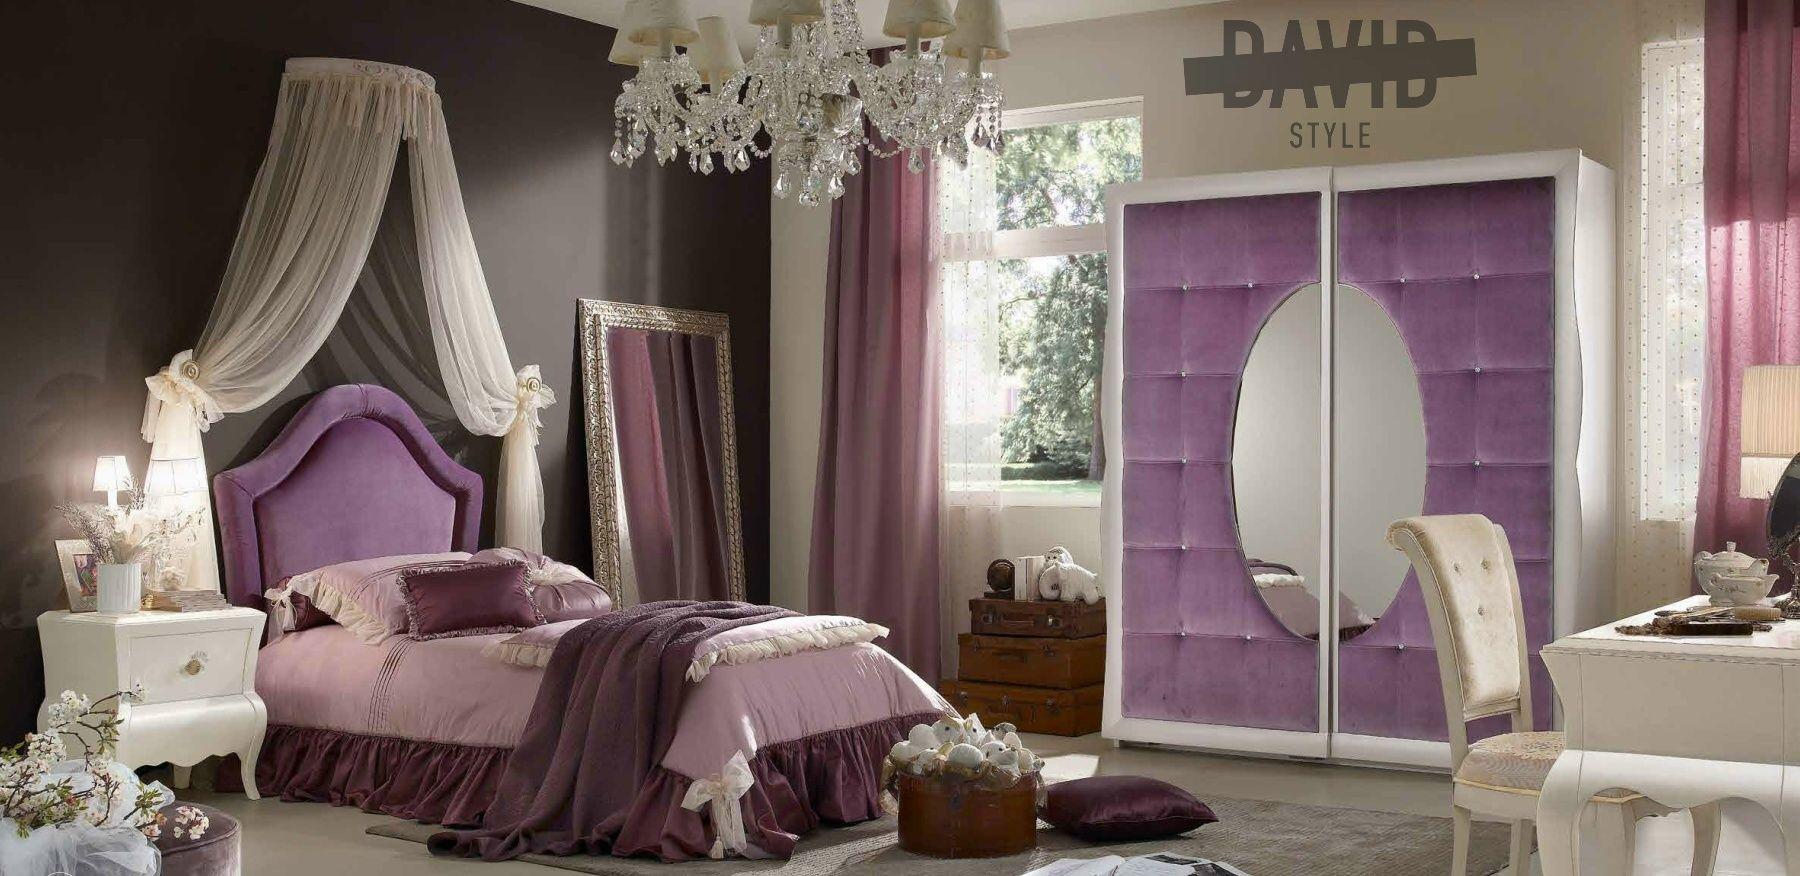 Luxury bedroom Camera da letto barocco moderno DavidStyle for your ...